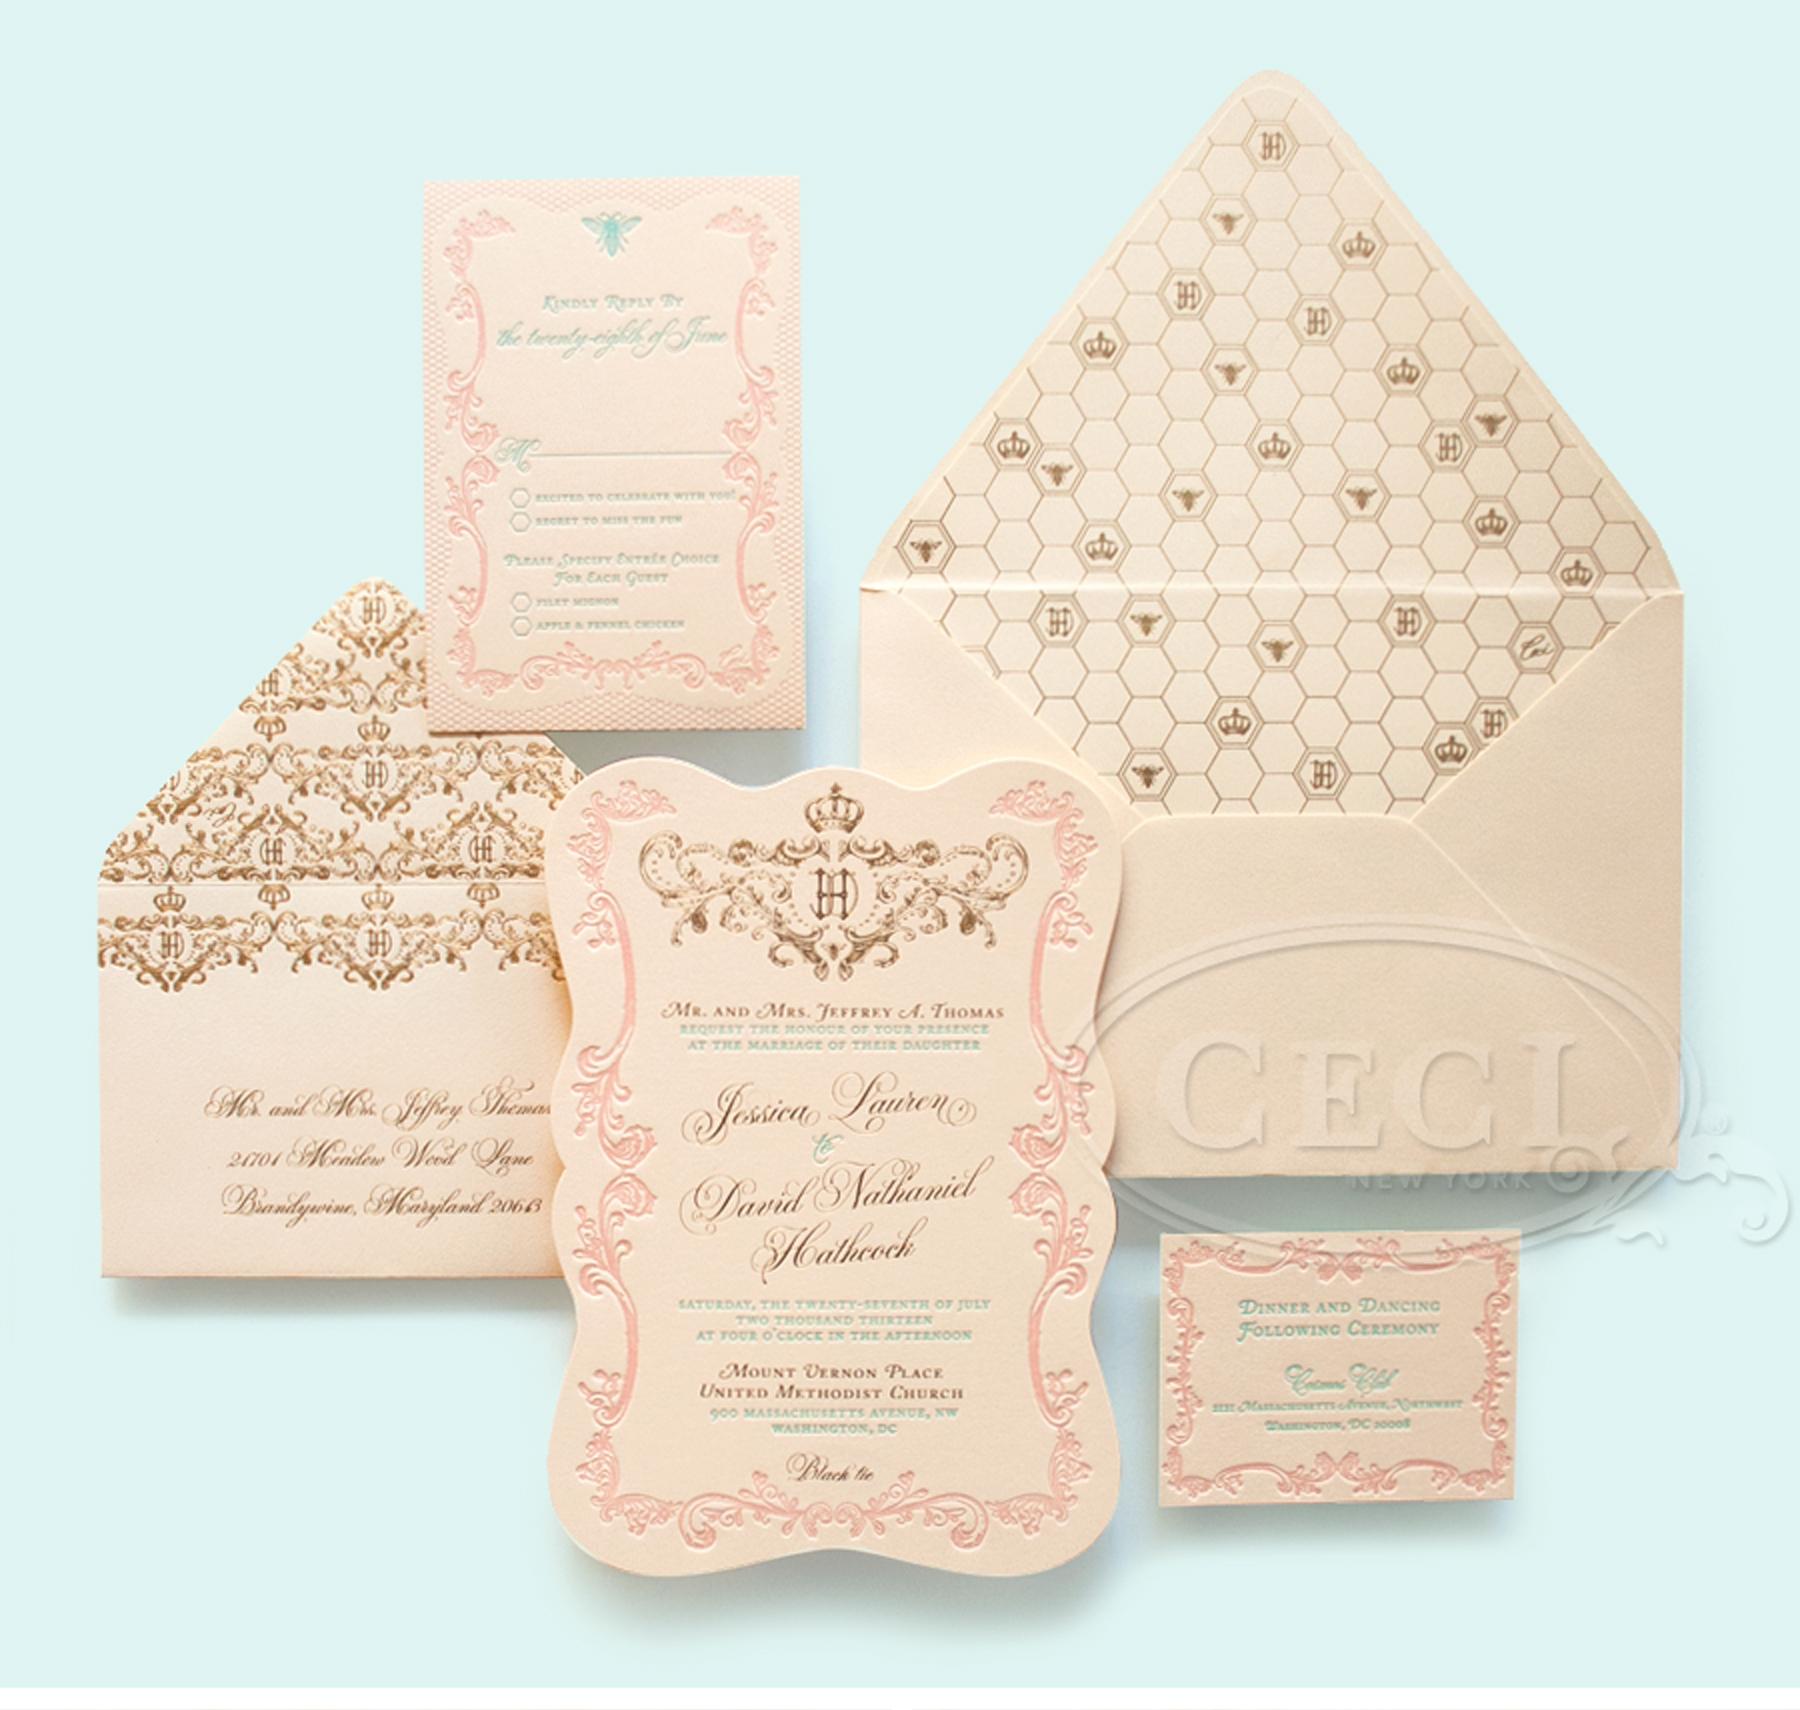 Die Cut Wedding Invites was luxury invitations sample